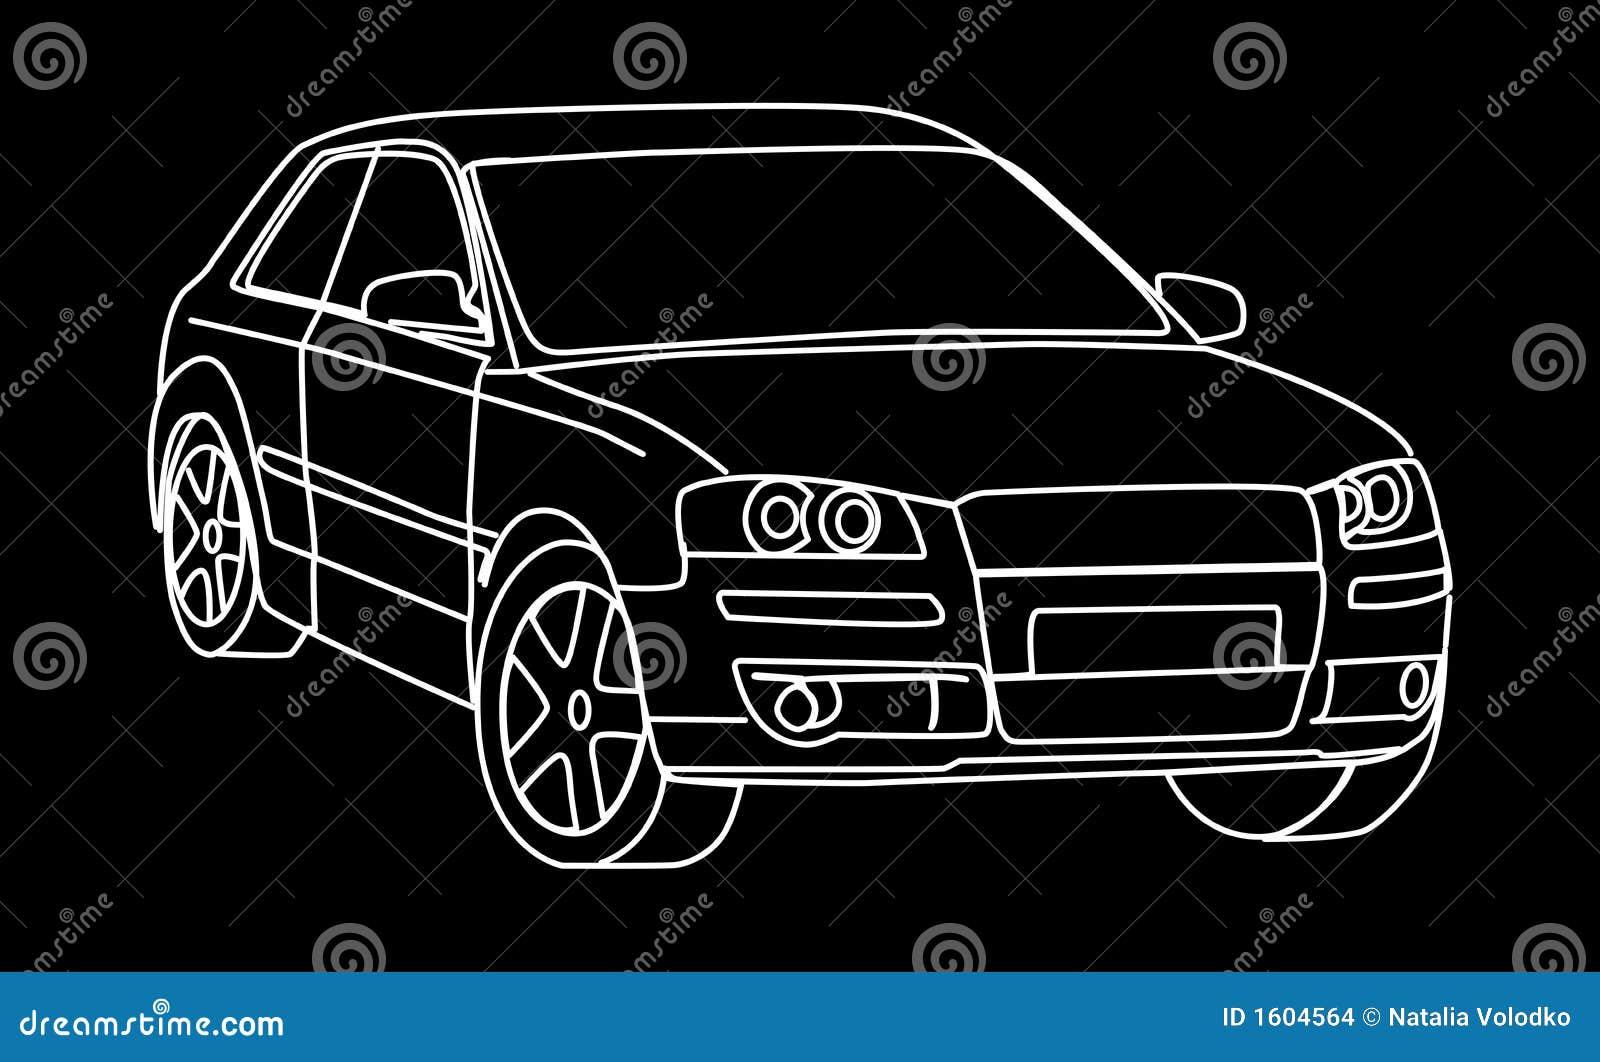 Skizze des Autos stock abbildung. Illustration von automobil - 1604564